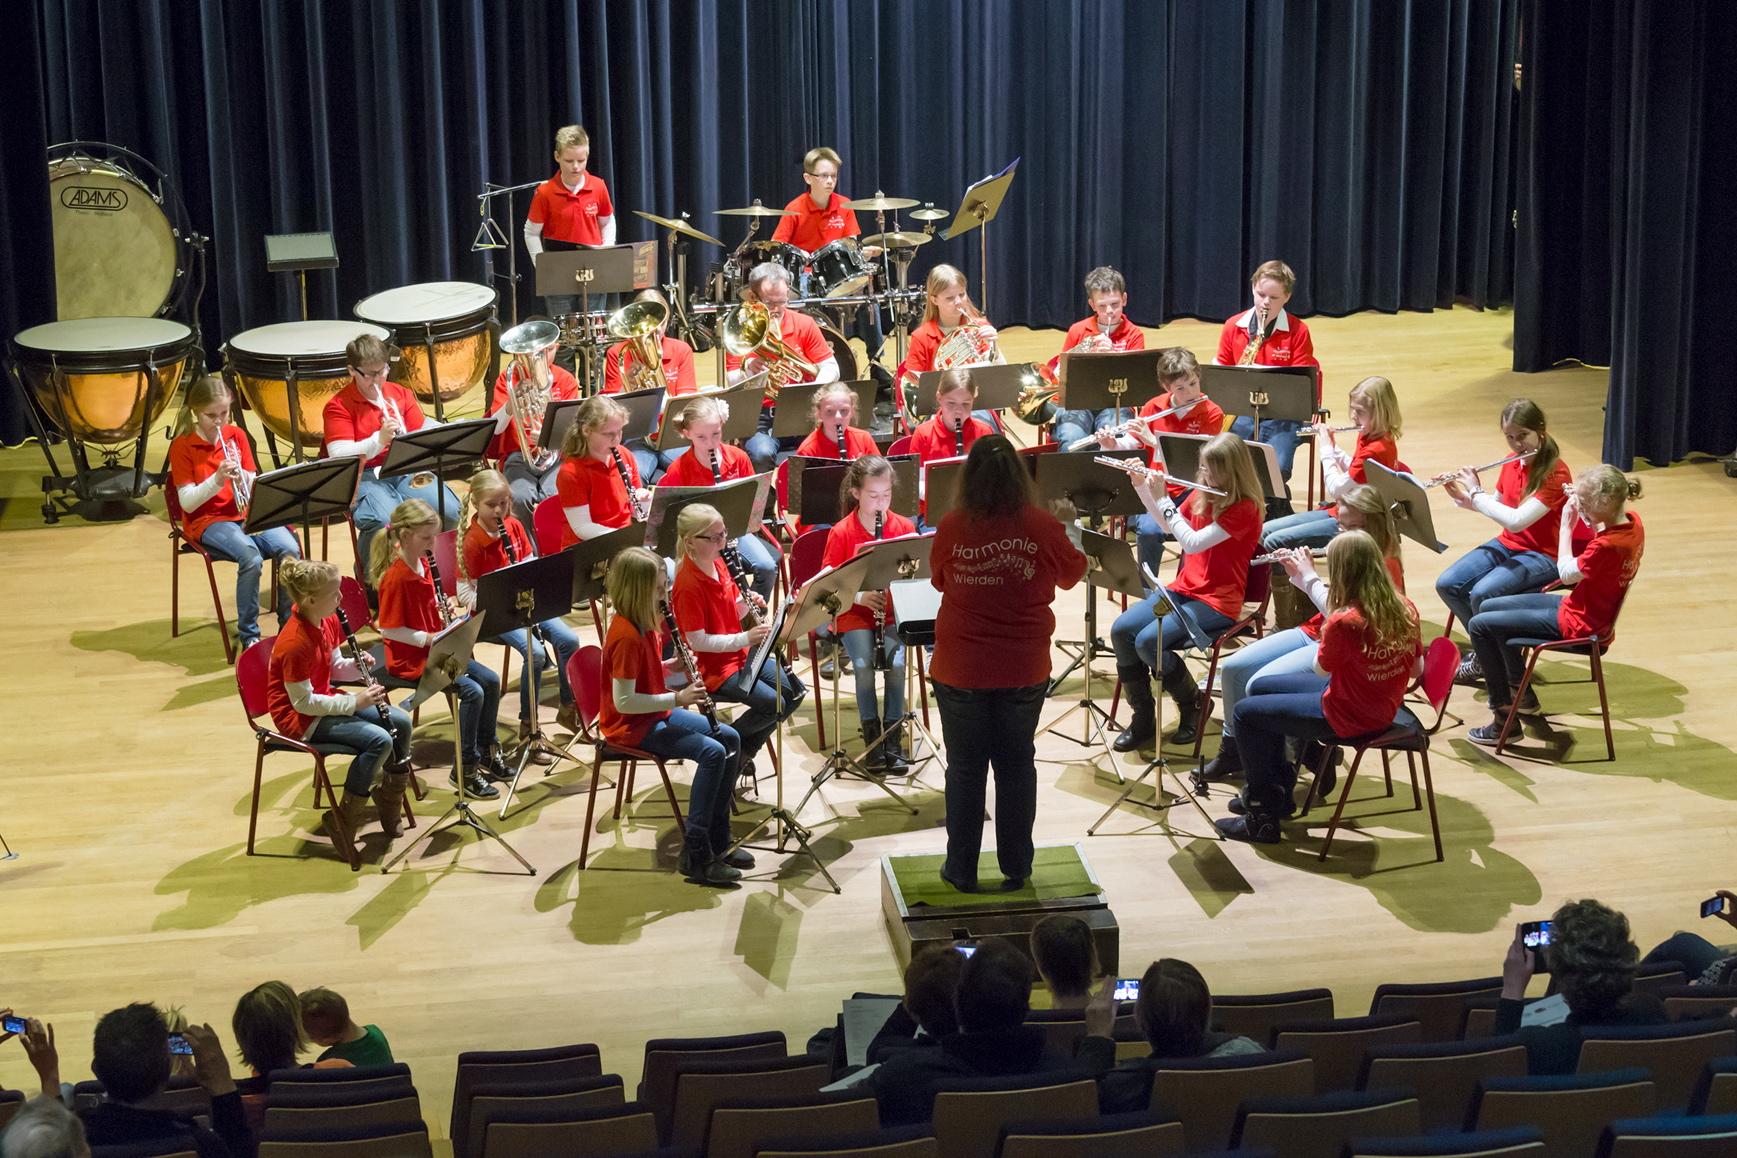 C-orkest tijdens Jeugdorkestenfestival Borne, 6 april 2013